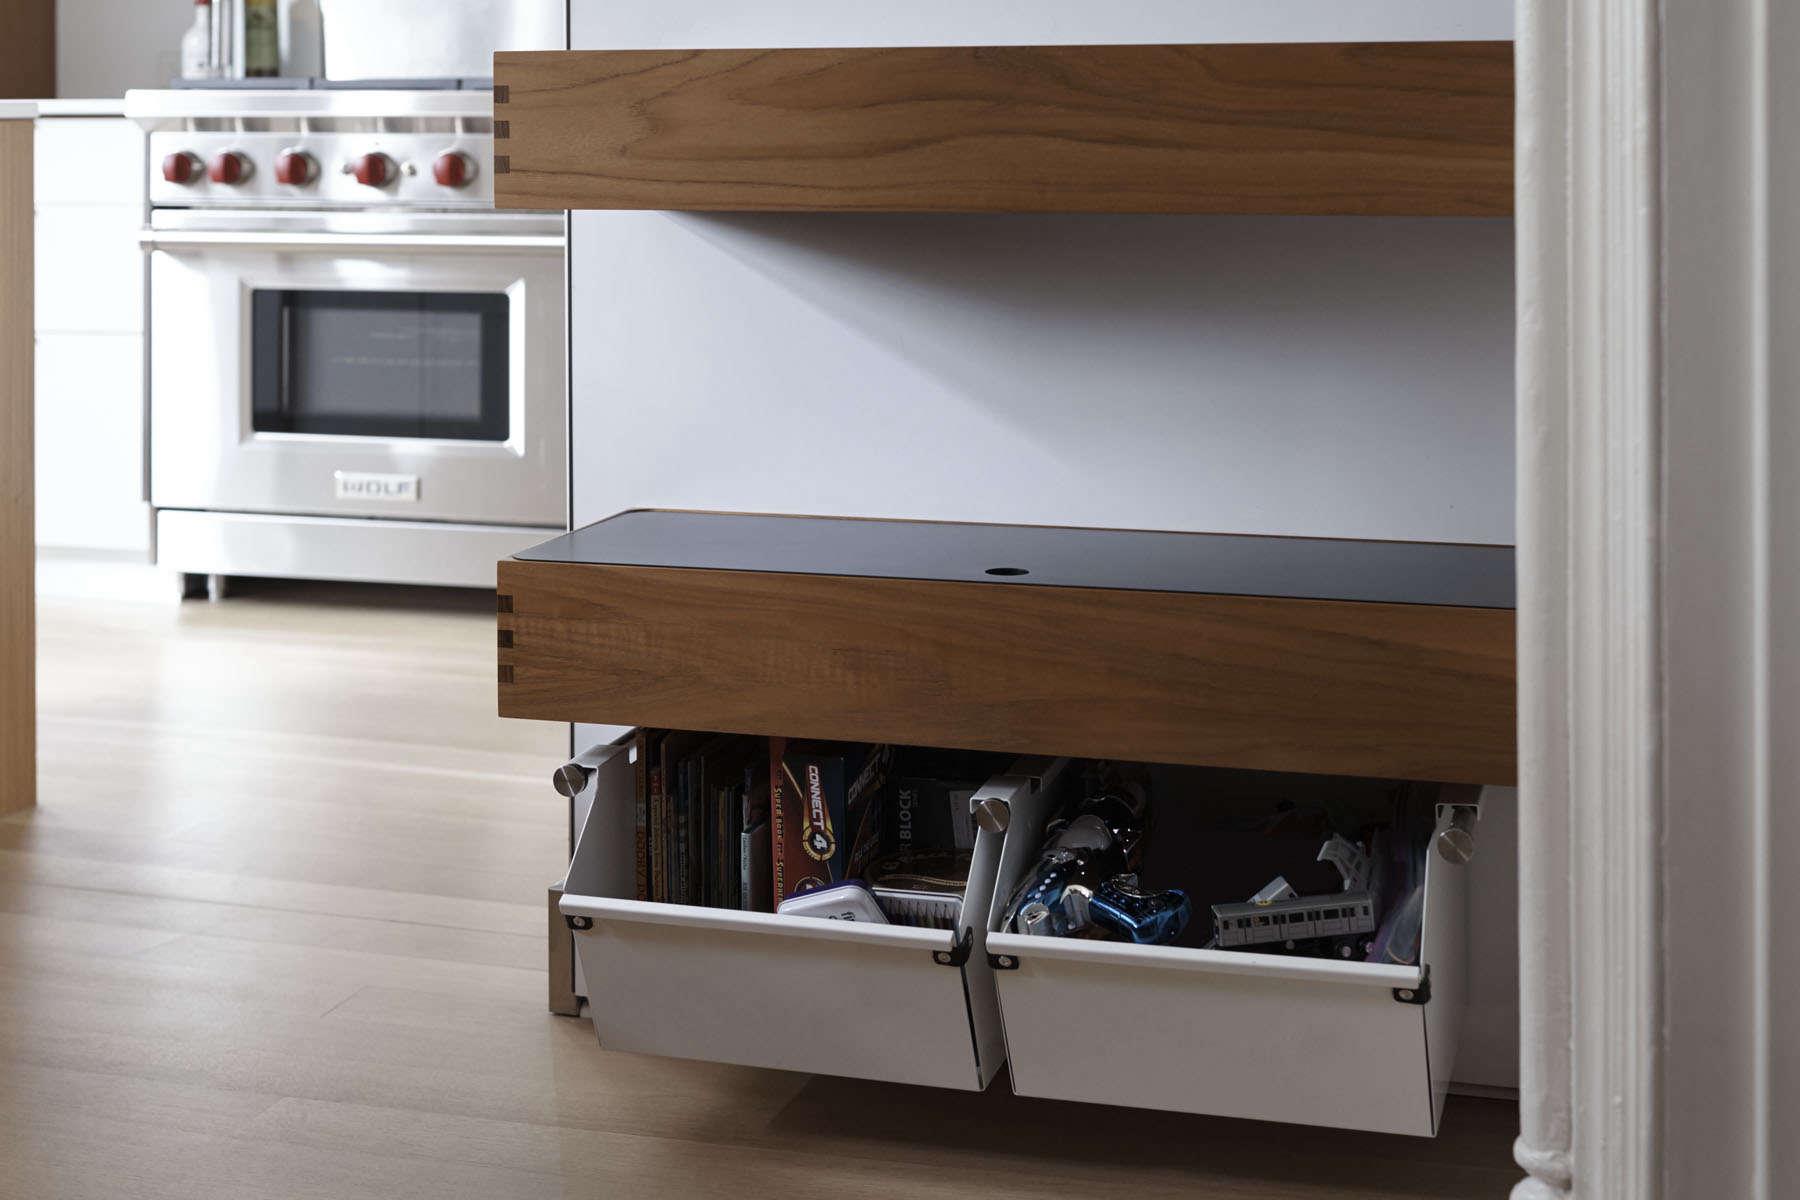 Powder-coated steel bins, a teak desk, and shelves from Henrybuilt's Opencase storage line